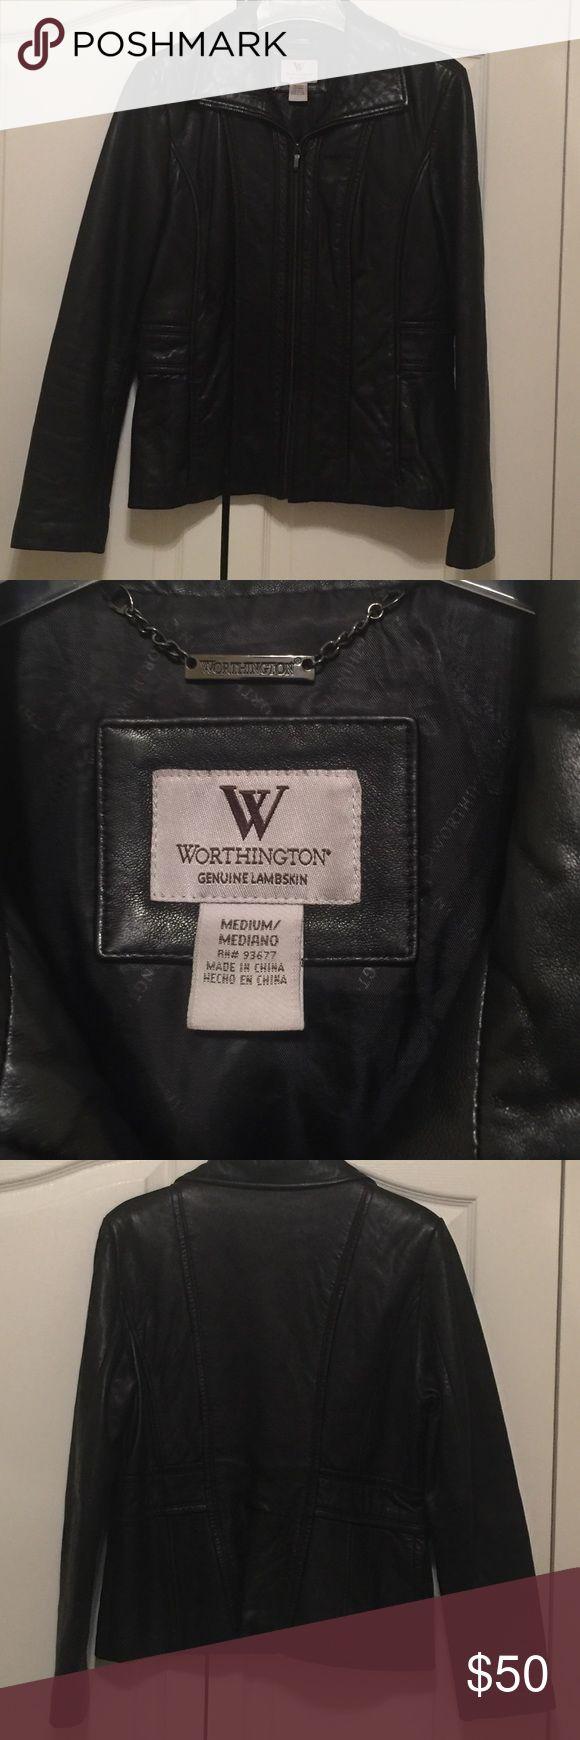 "Worthington ""genuine lambskin leather"" Jacket Worthington ""genuine lambskin leather"" Jacket.  Black size medium. Leather is soft and in mint condition Worthington Jackets & Coats Blazers"